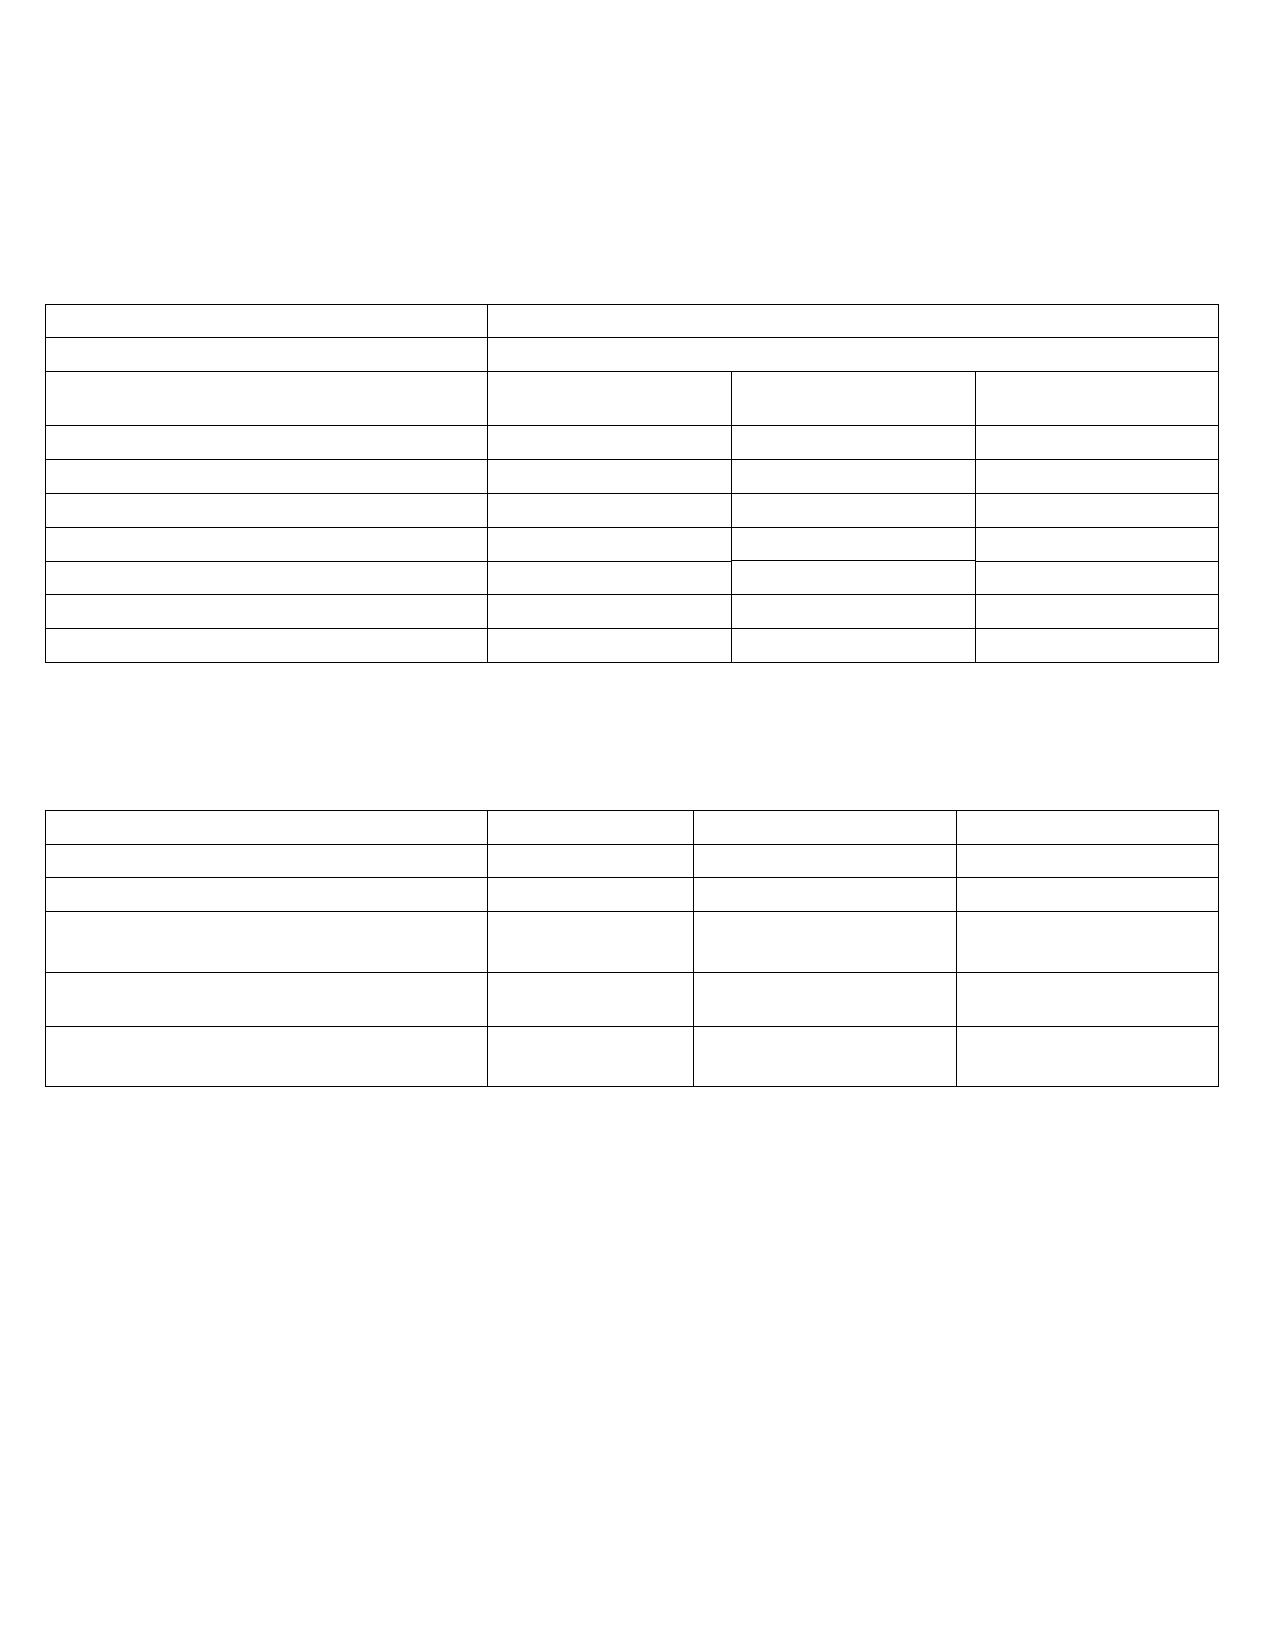 MR2402 데이터시트 및 MR2402 PDF